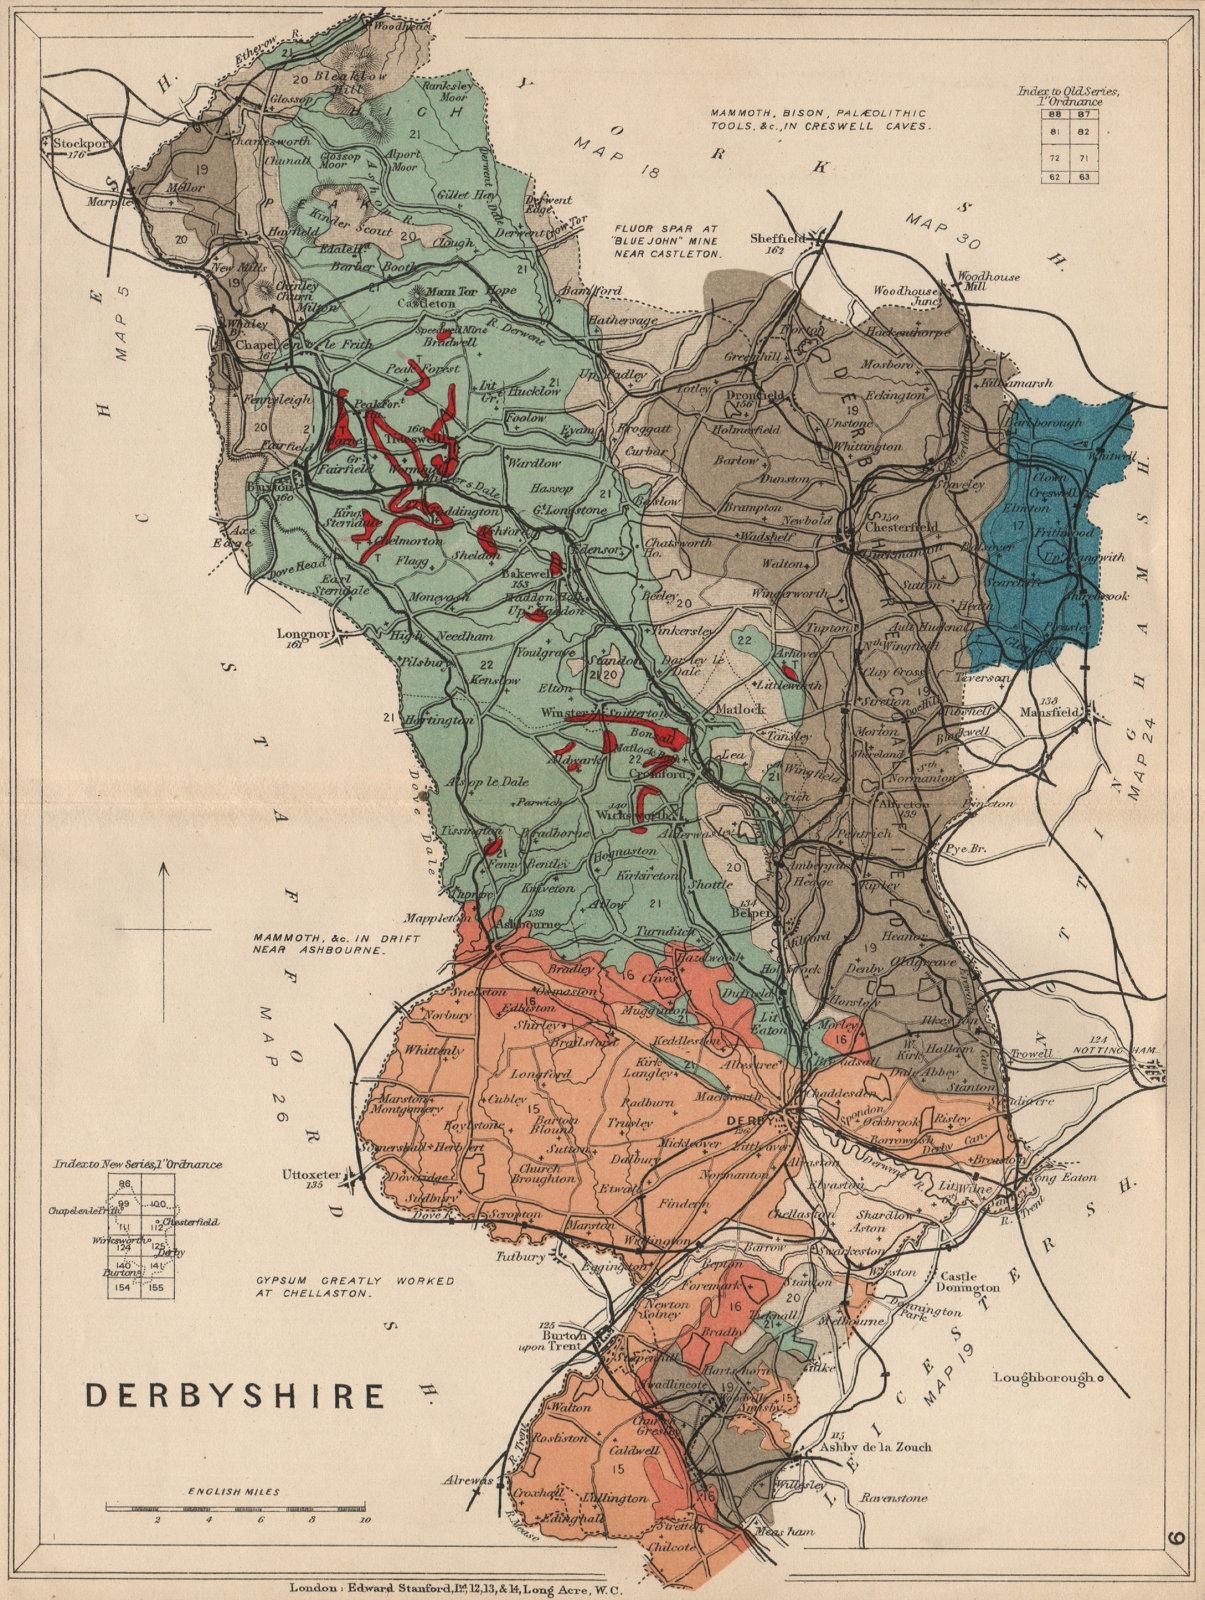 Associate Product DERBYSHIRE Geological map. STANFORD 1913 old antique vintage plan chart